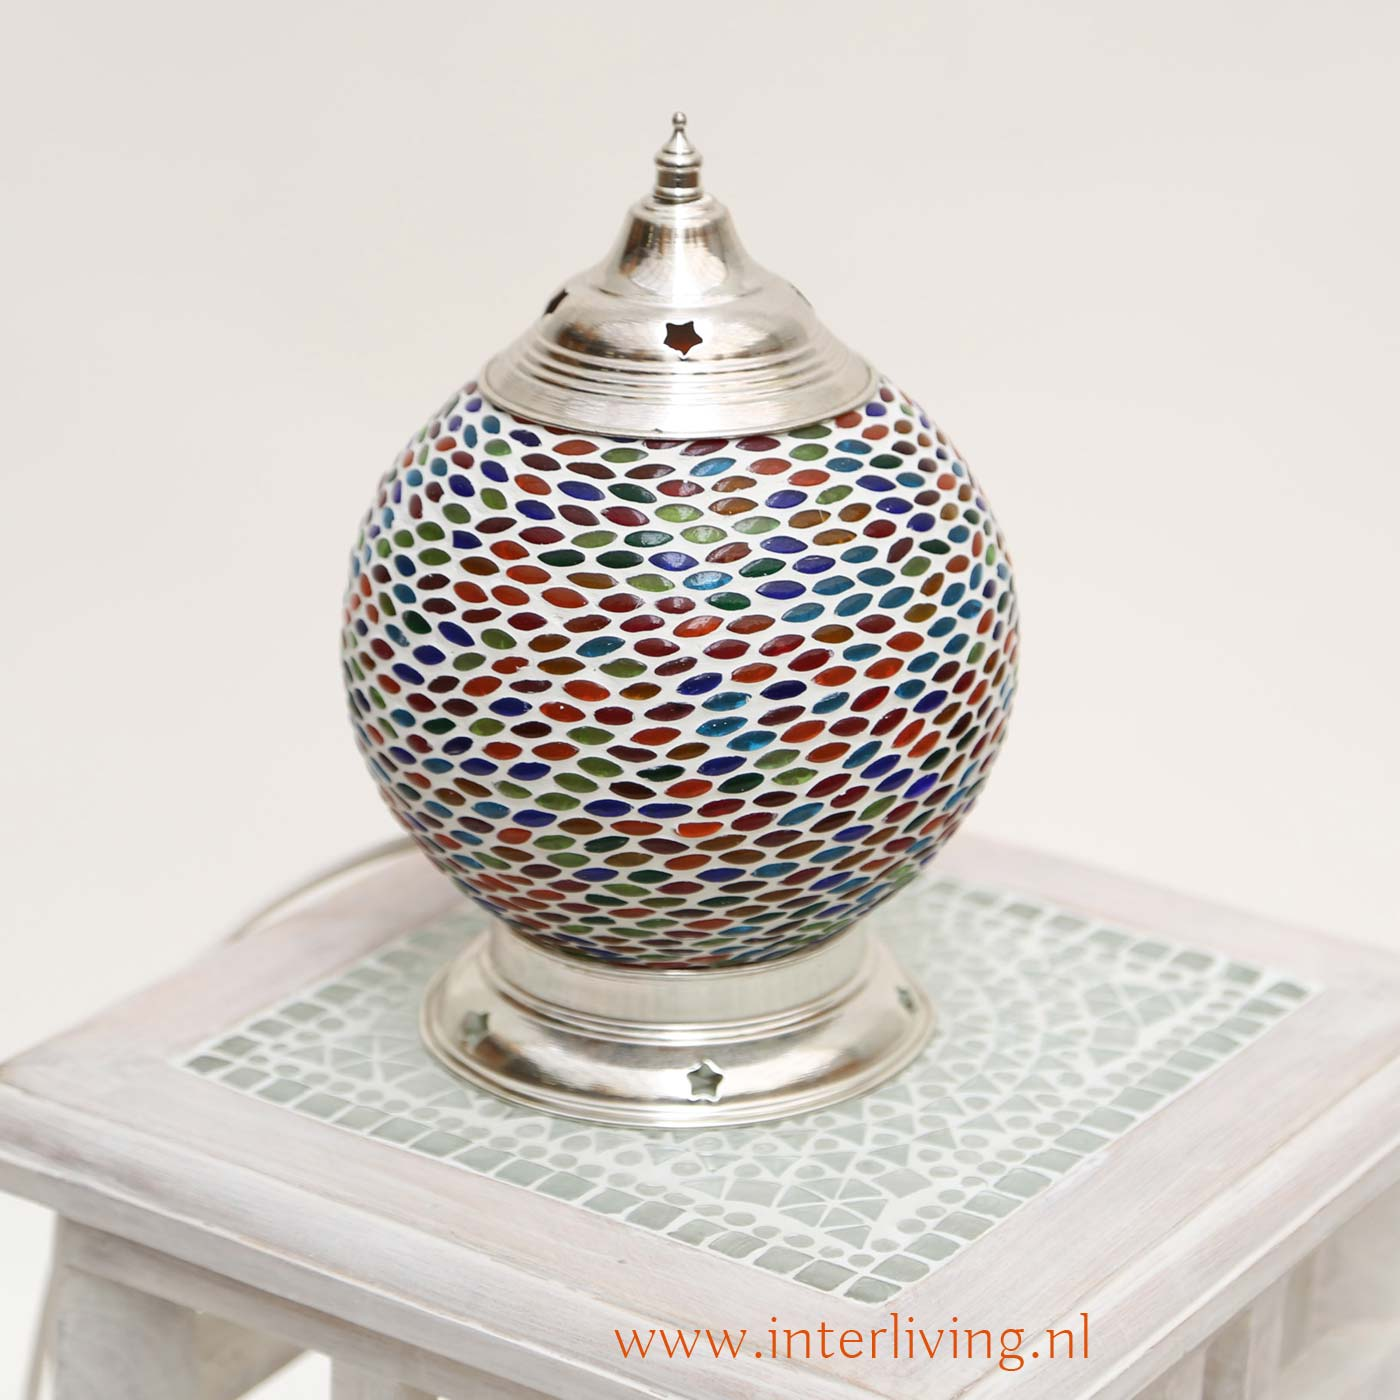 handgemaakt met ovale stukjes gekleurd glas een bolvorm tafellamp